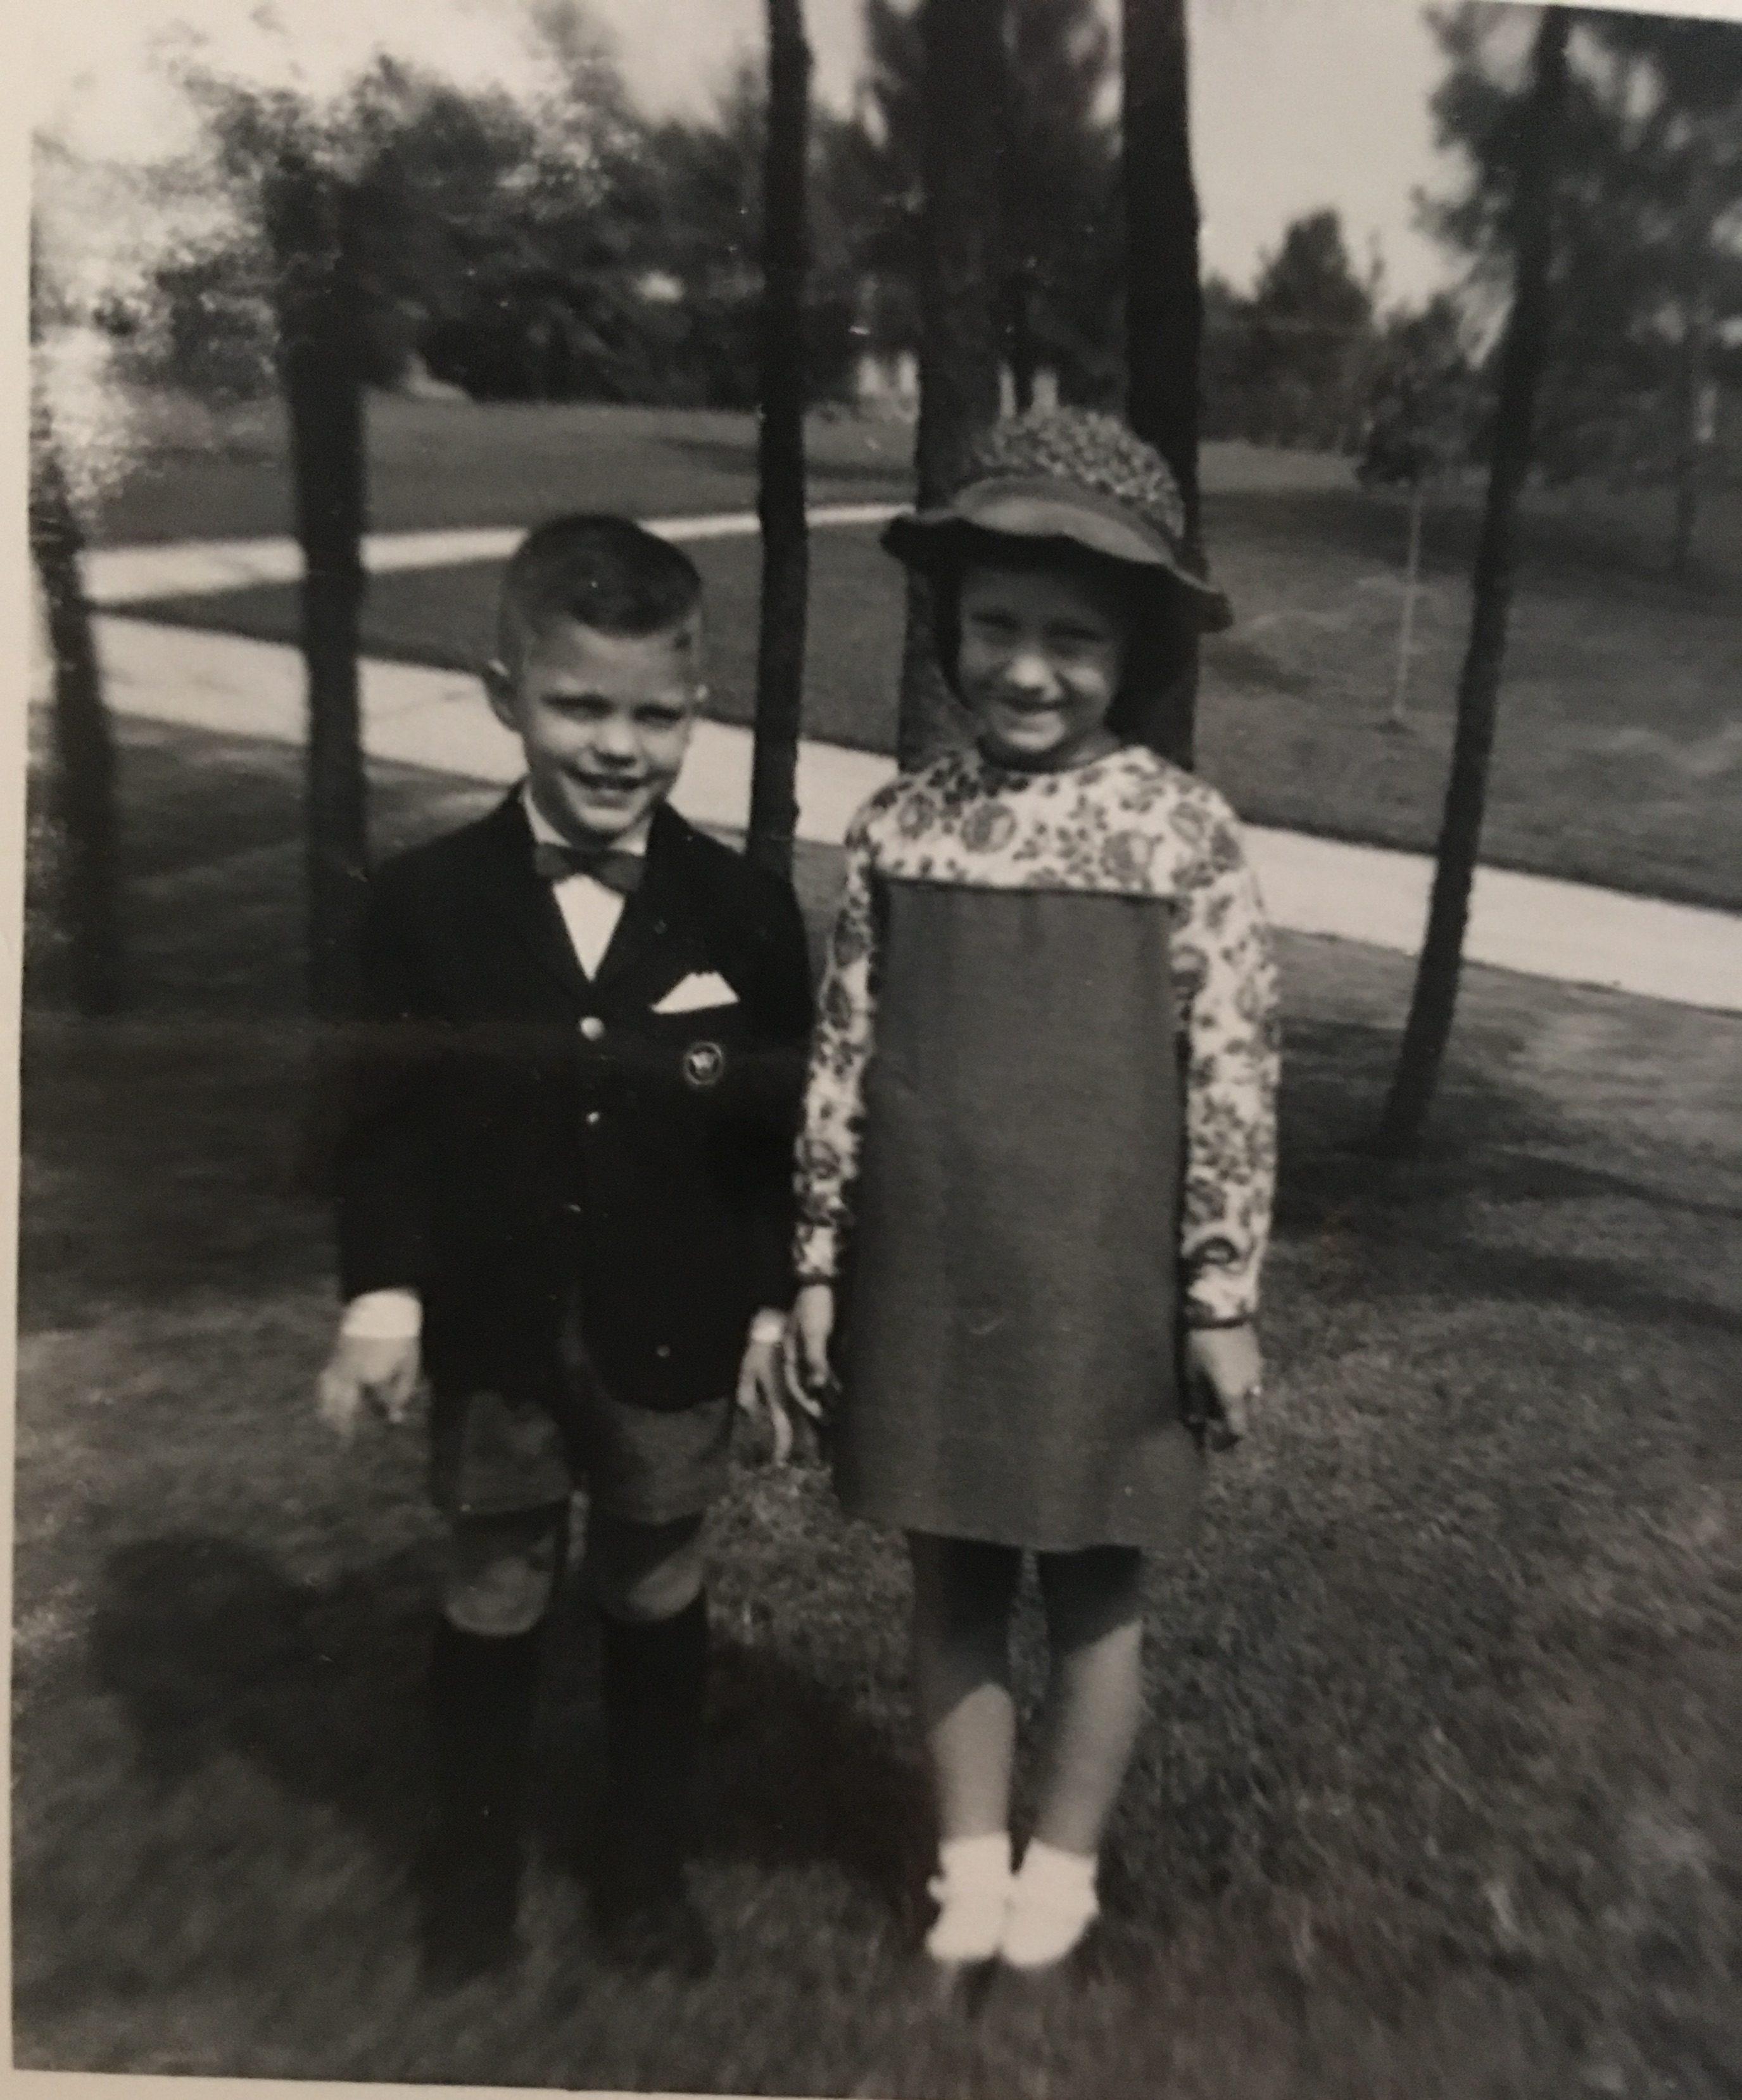 Douglas Brinkley as a young boy